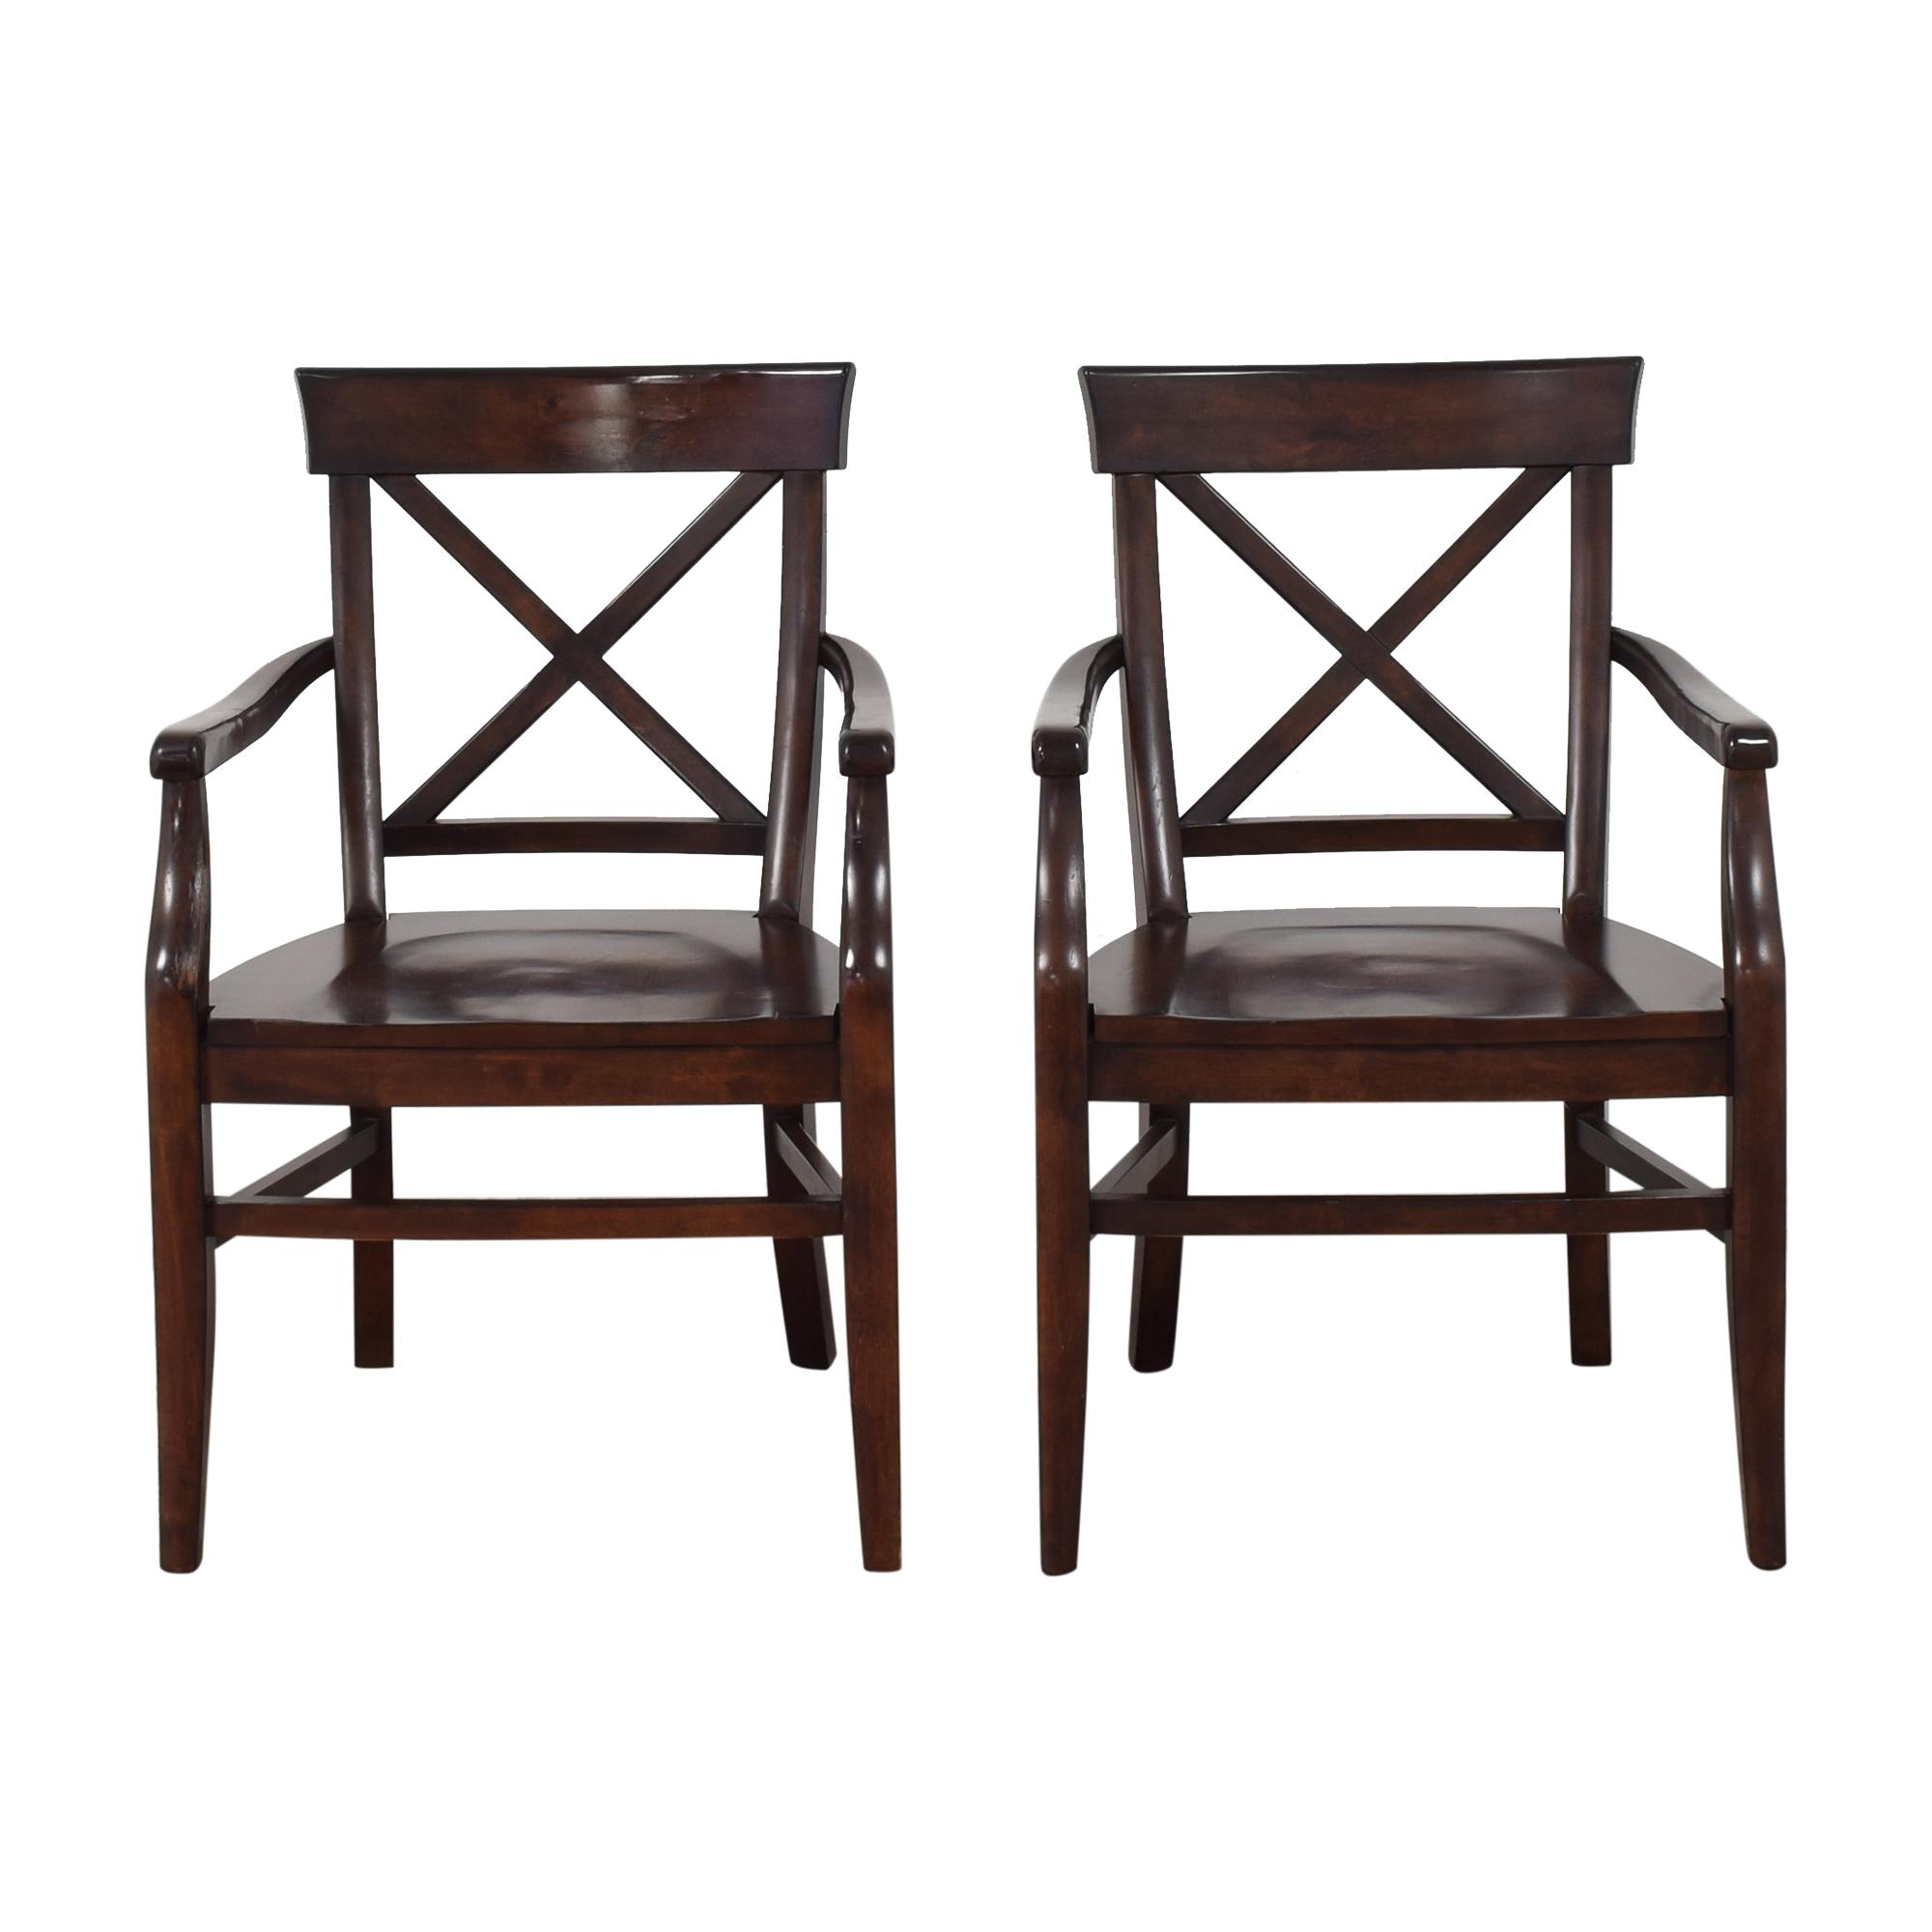 Pottery Barn Pottery Barn Aaron Dining Arm Chairs nj